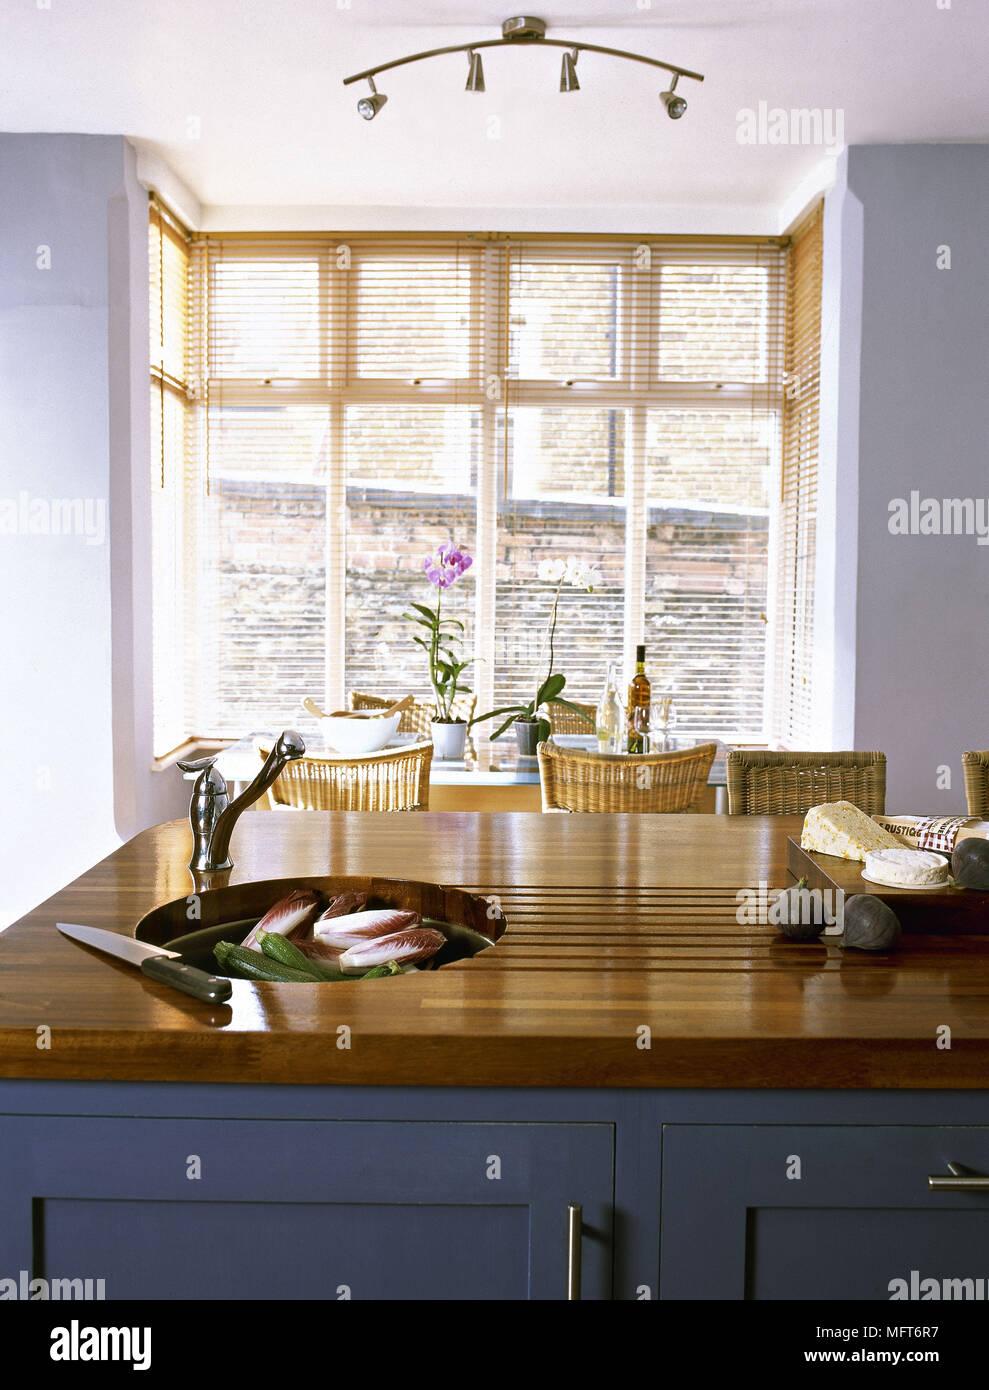 Cocina moderna mesa de comedor, sillas de mimbre isla central unidad ...